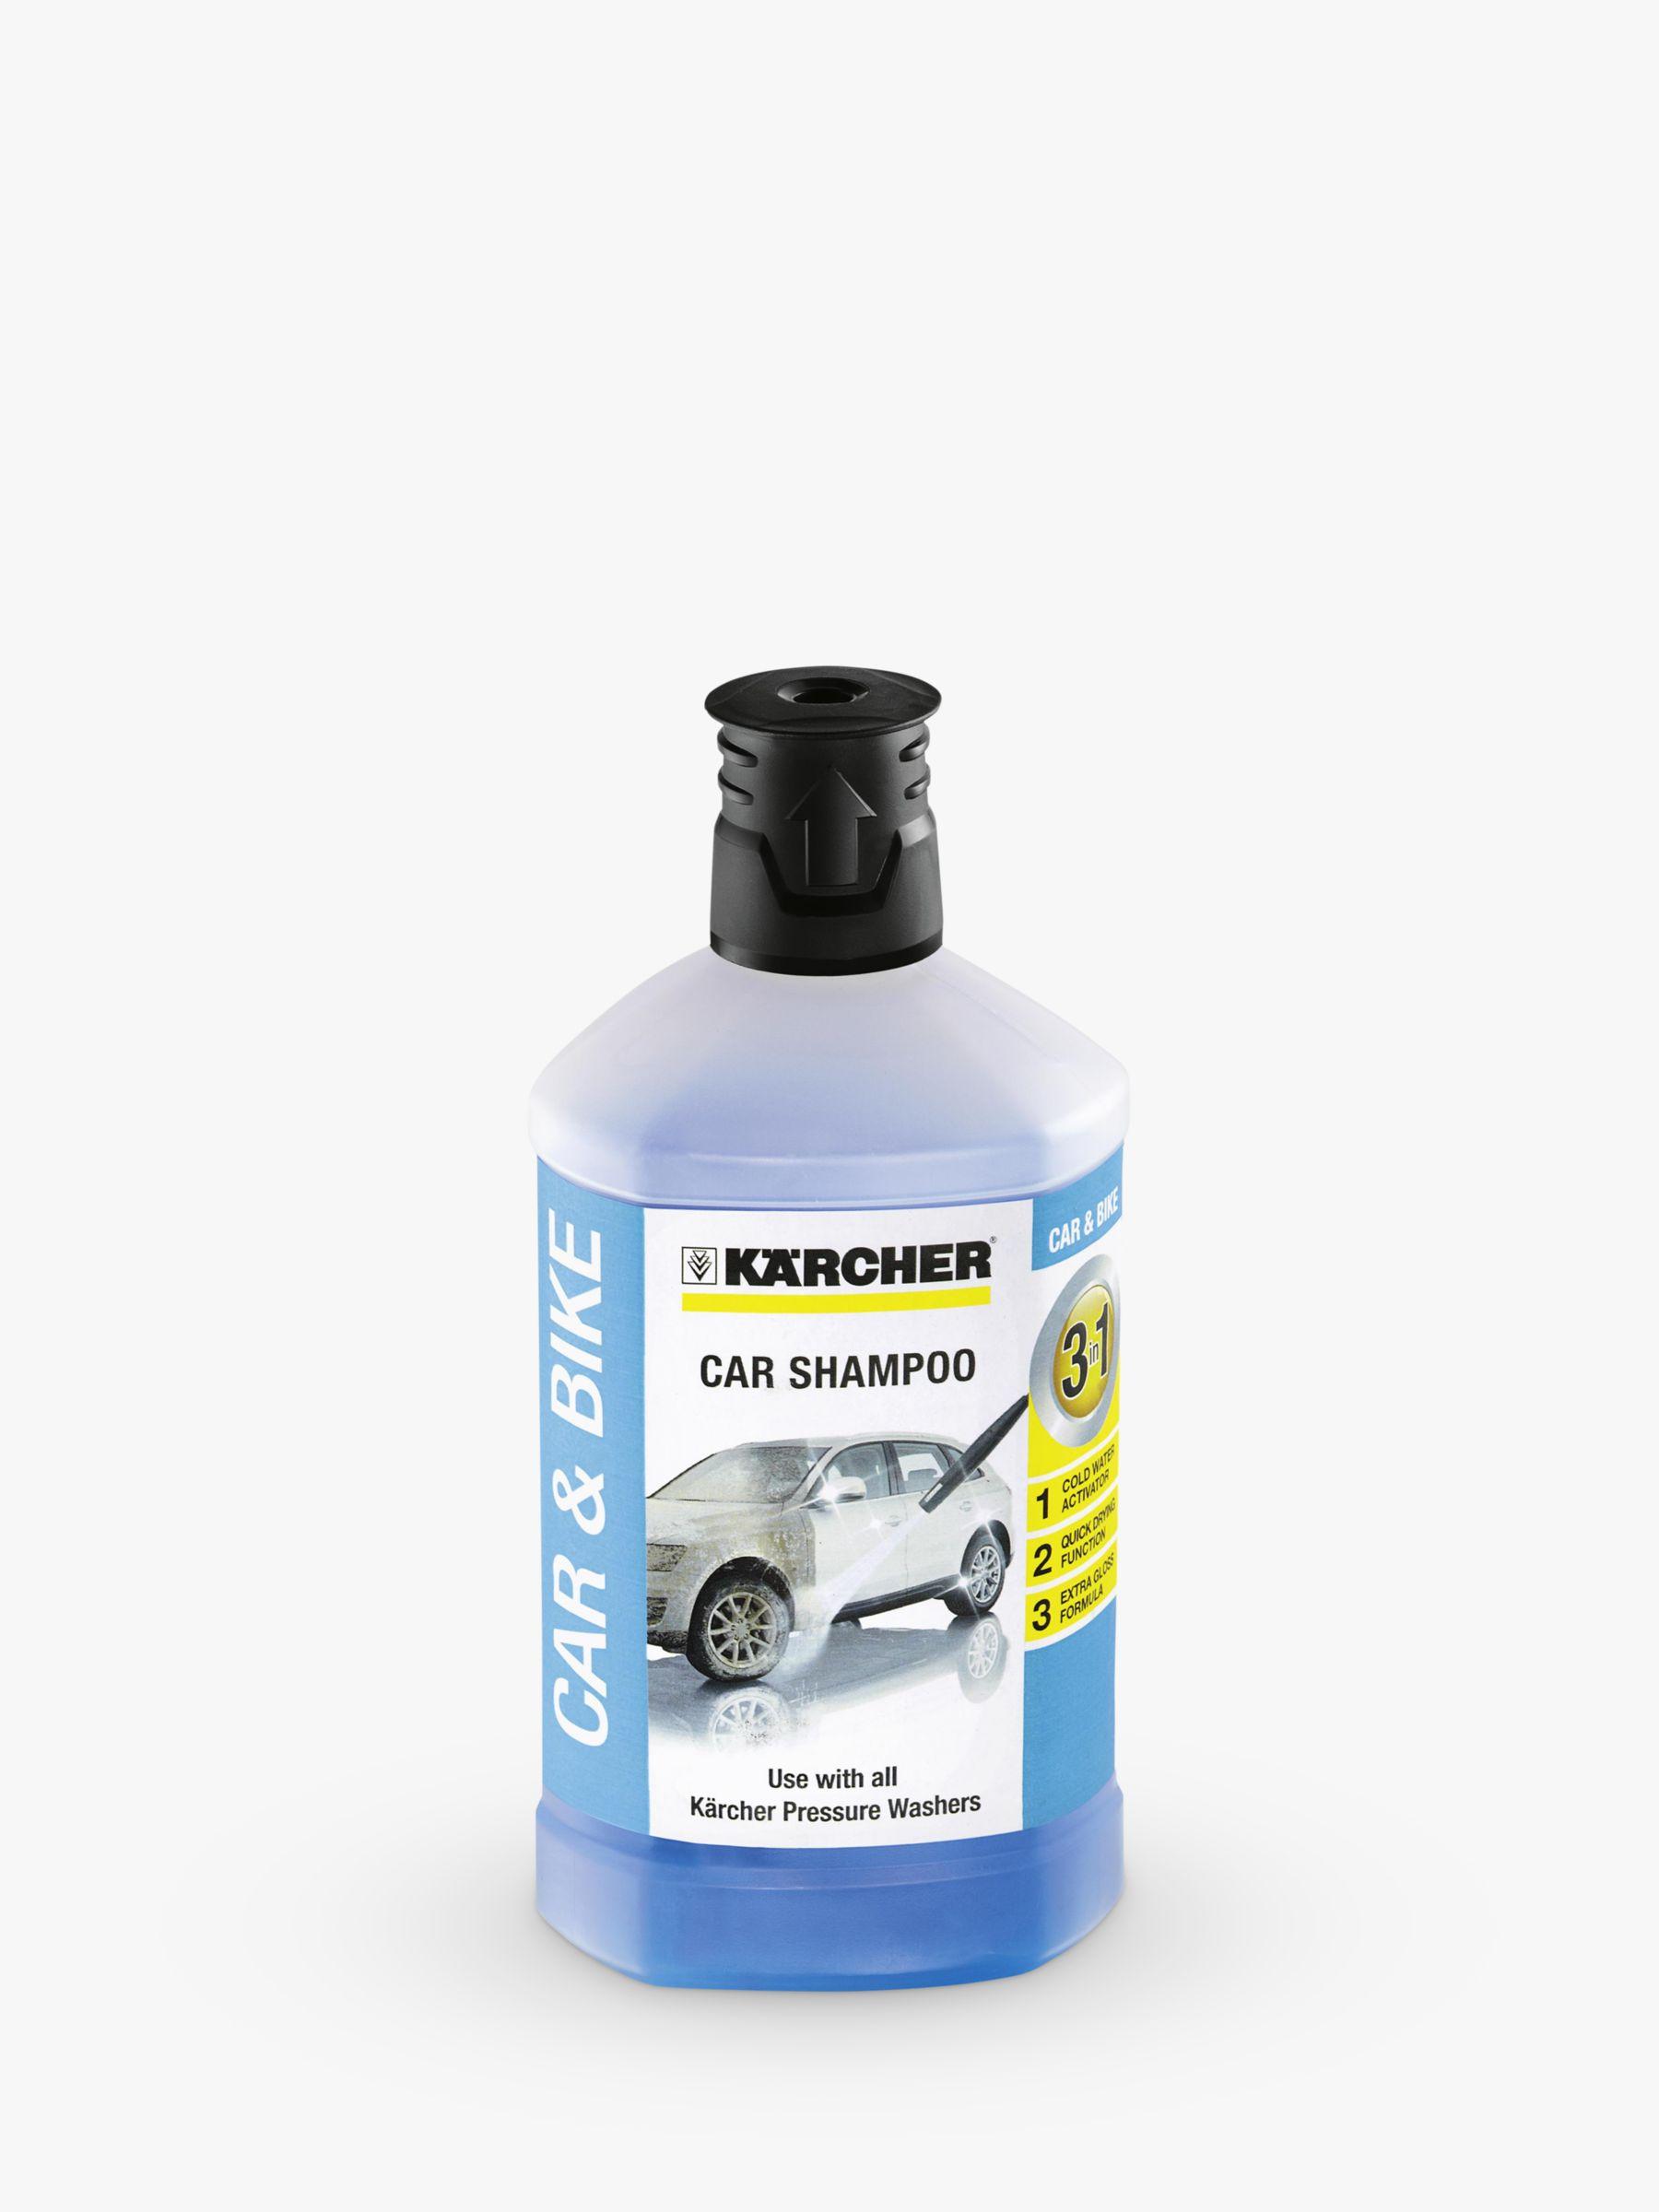 Karcher Kärcher 3-in-1 Car Shampoo, 1L